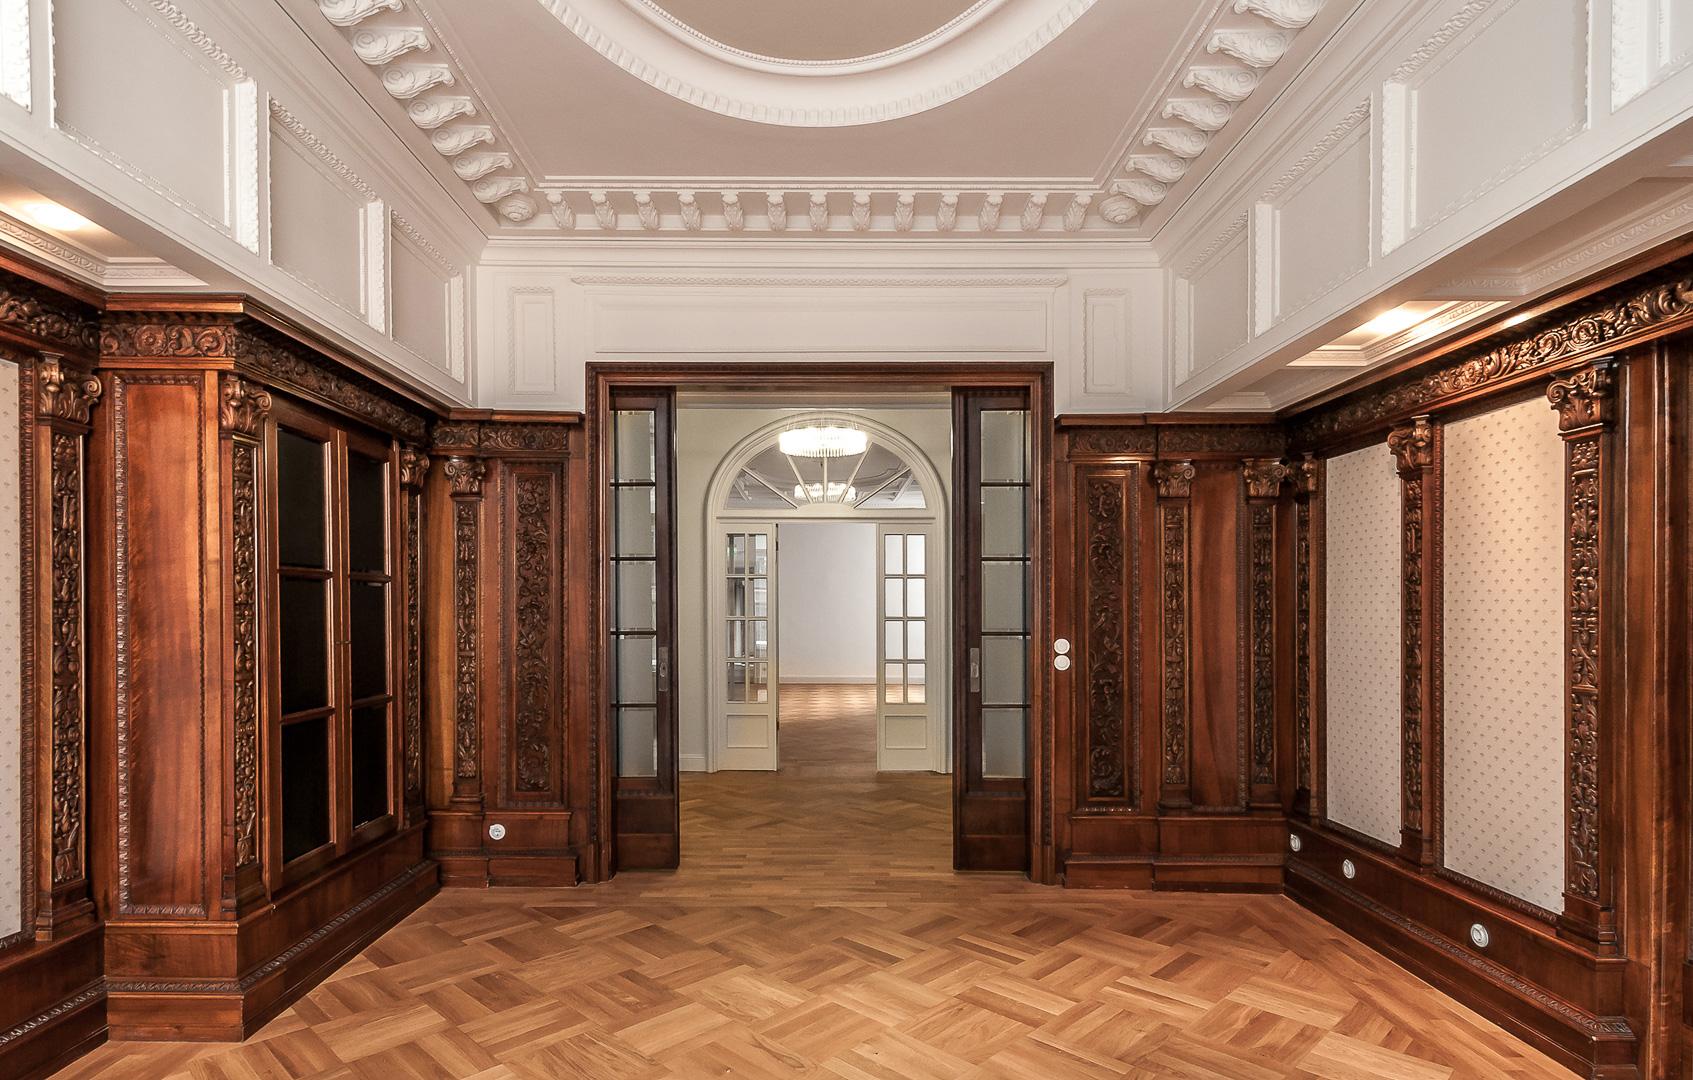 Repräsentatives Büro, Holzvertäfelung, Schnitzerei, Stuckdecke